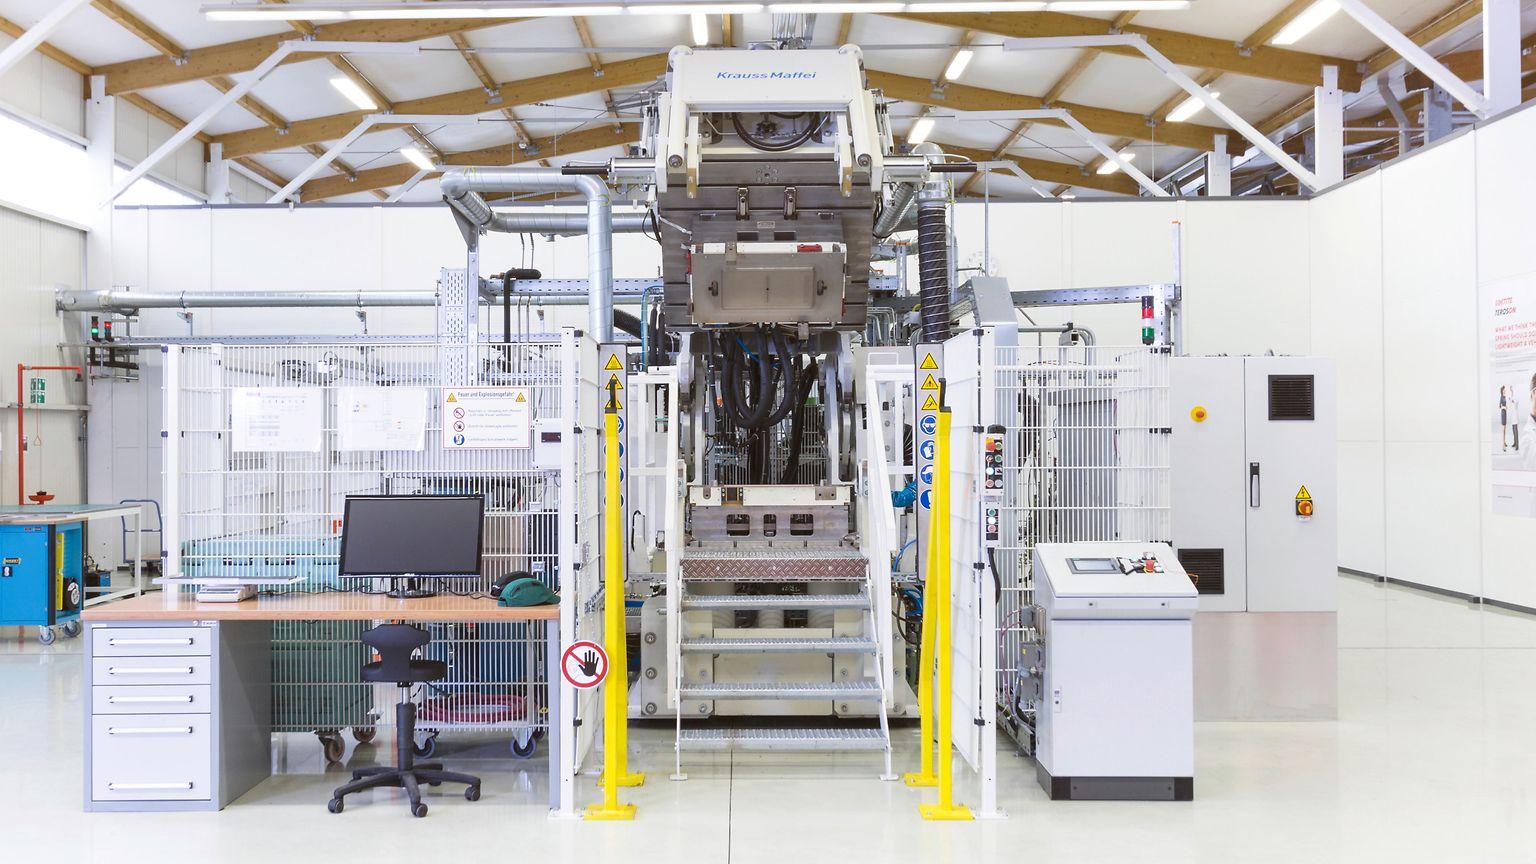 Hochdruck-RTM-Anlage (Resin Transfer Molding) im Komposit-Testcenter